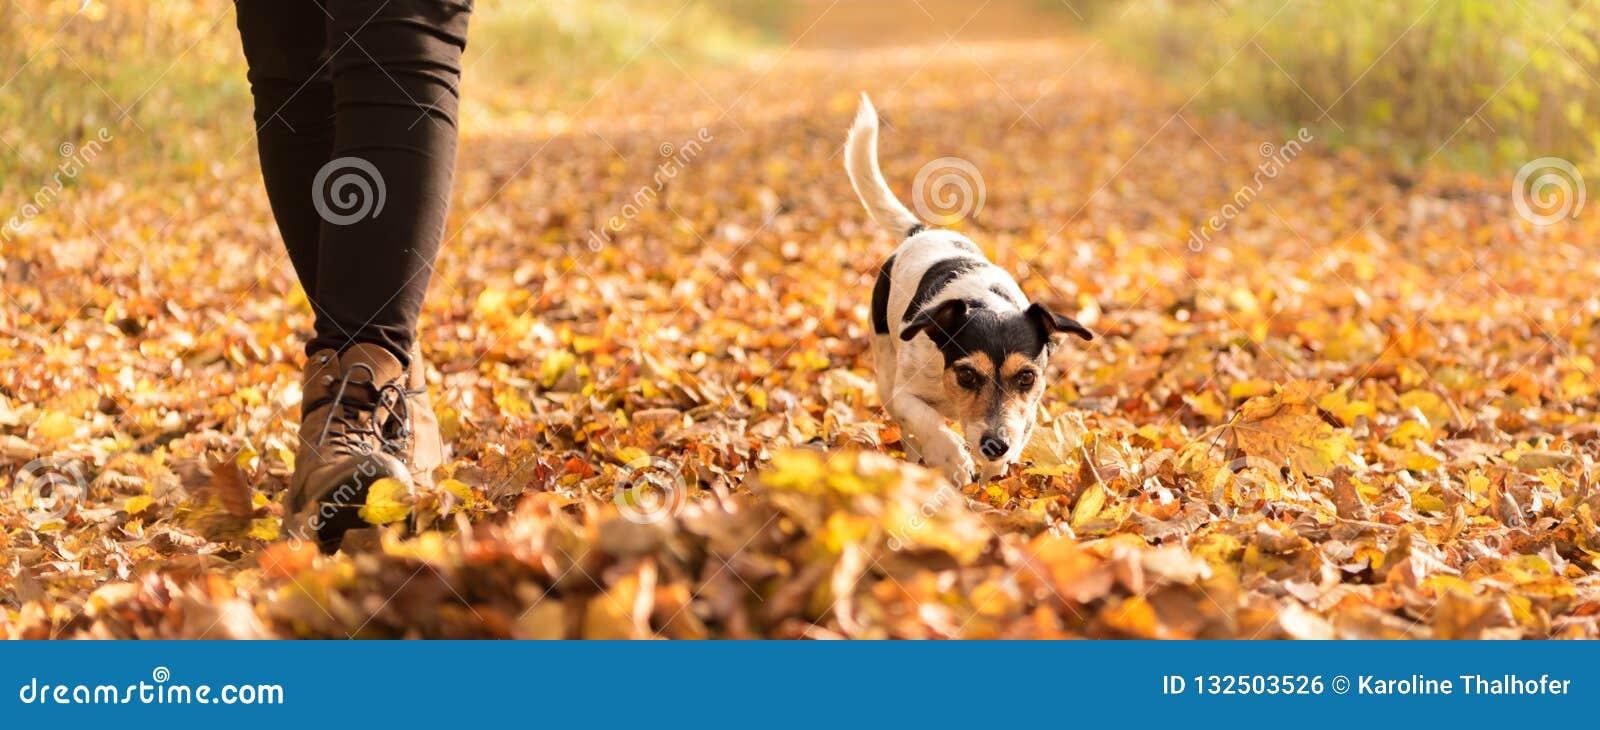 Inhaber Jack Russell Terrier im Herbstlaub